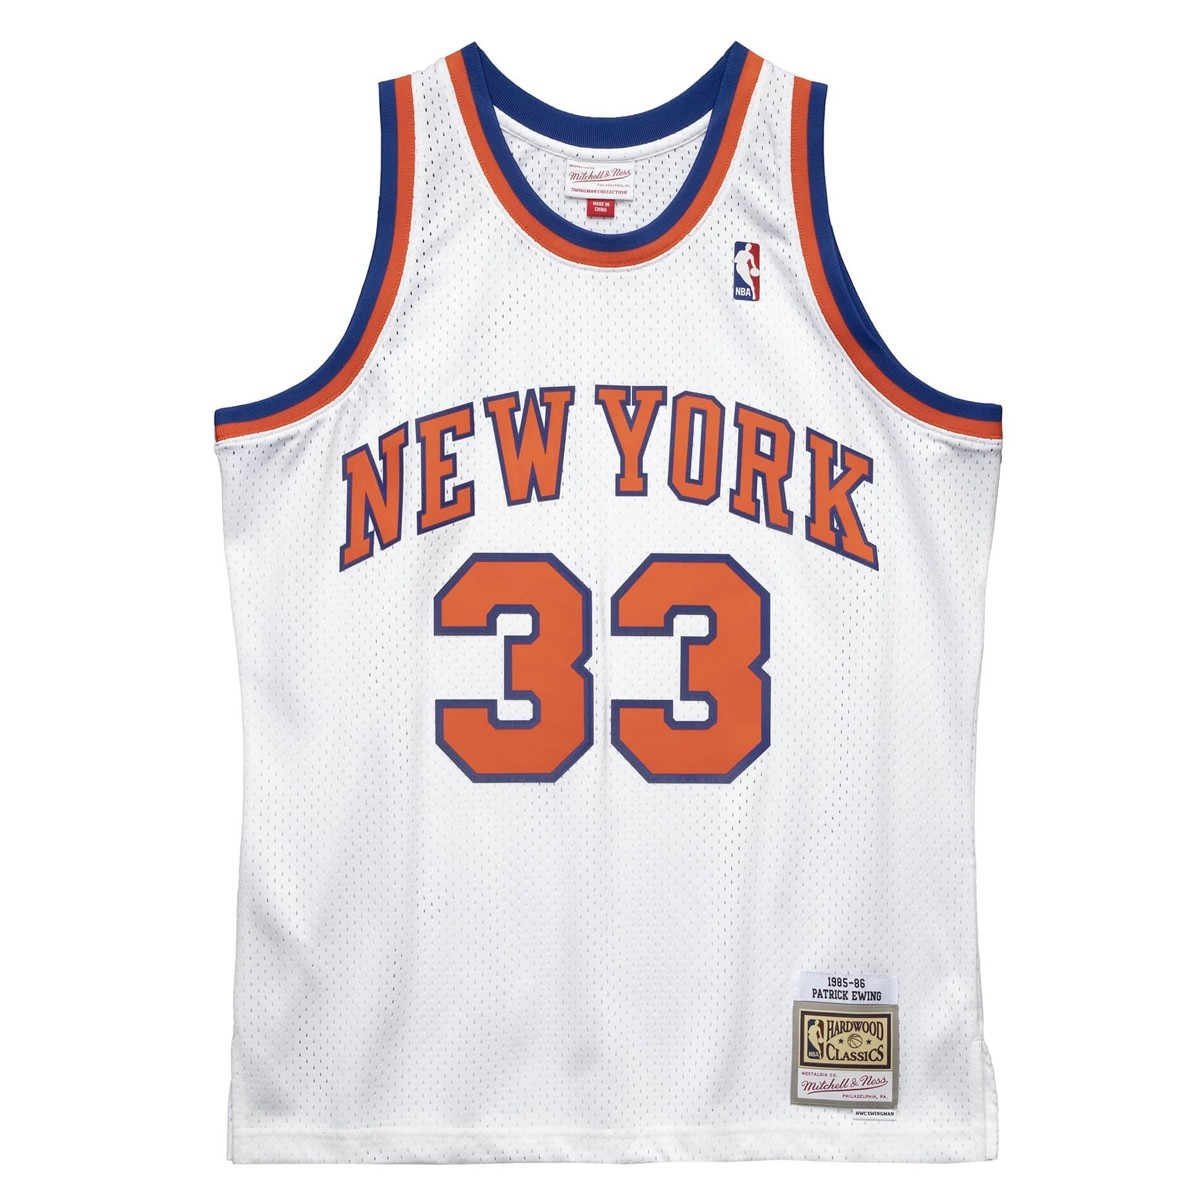 Mitchell & Ness Swingman New York Knicks 1985-86 'Patrick Ewing'